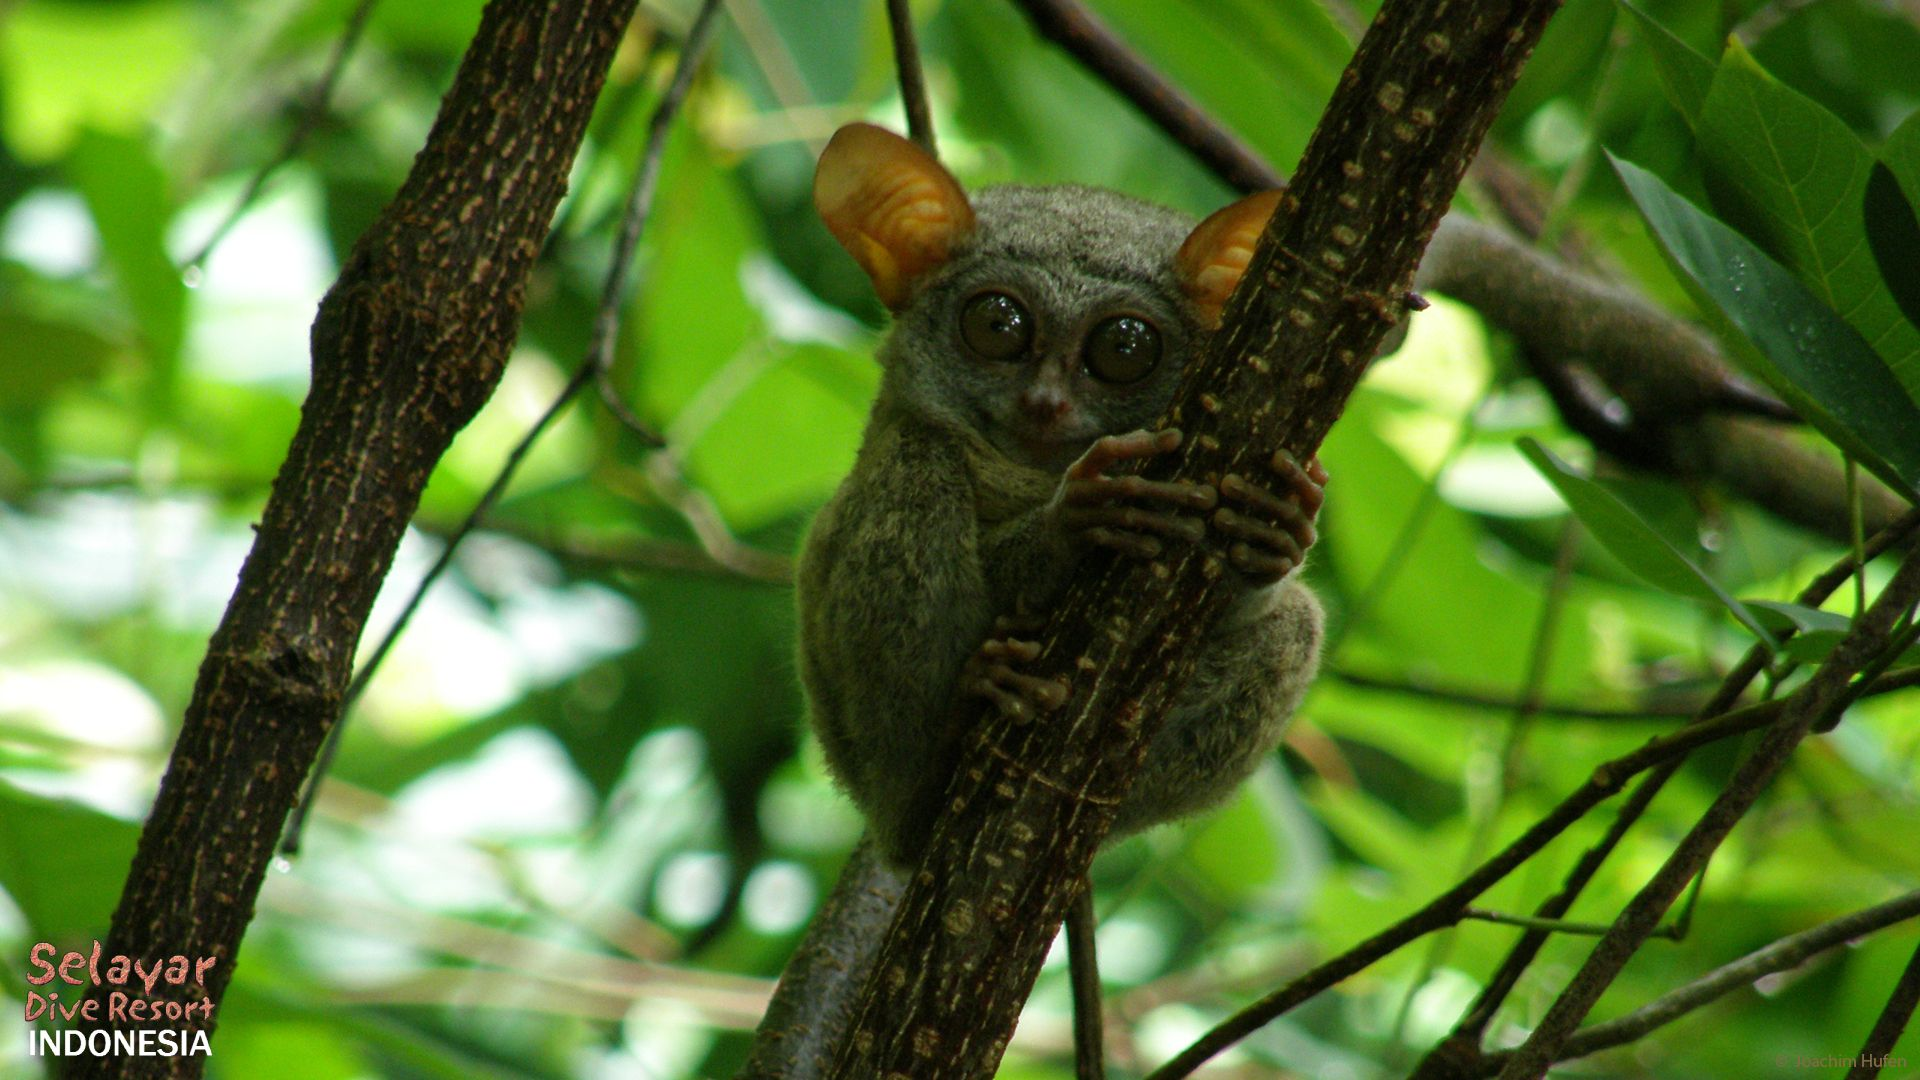 Tarsier Monkey Sulawesi Eco Resort Indonesia